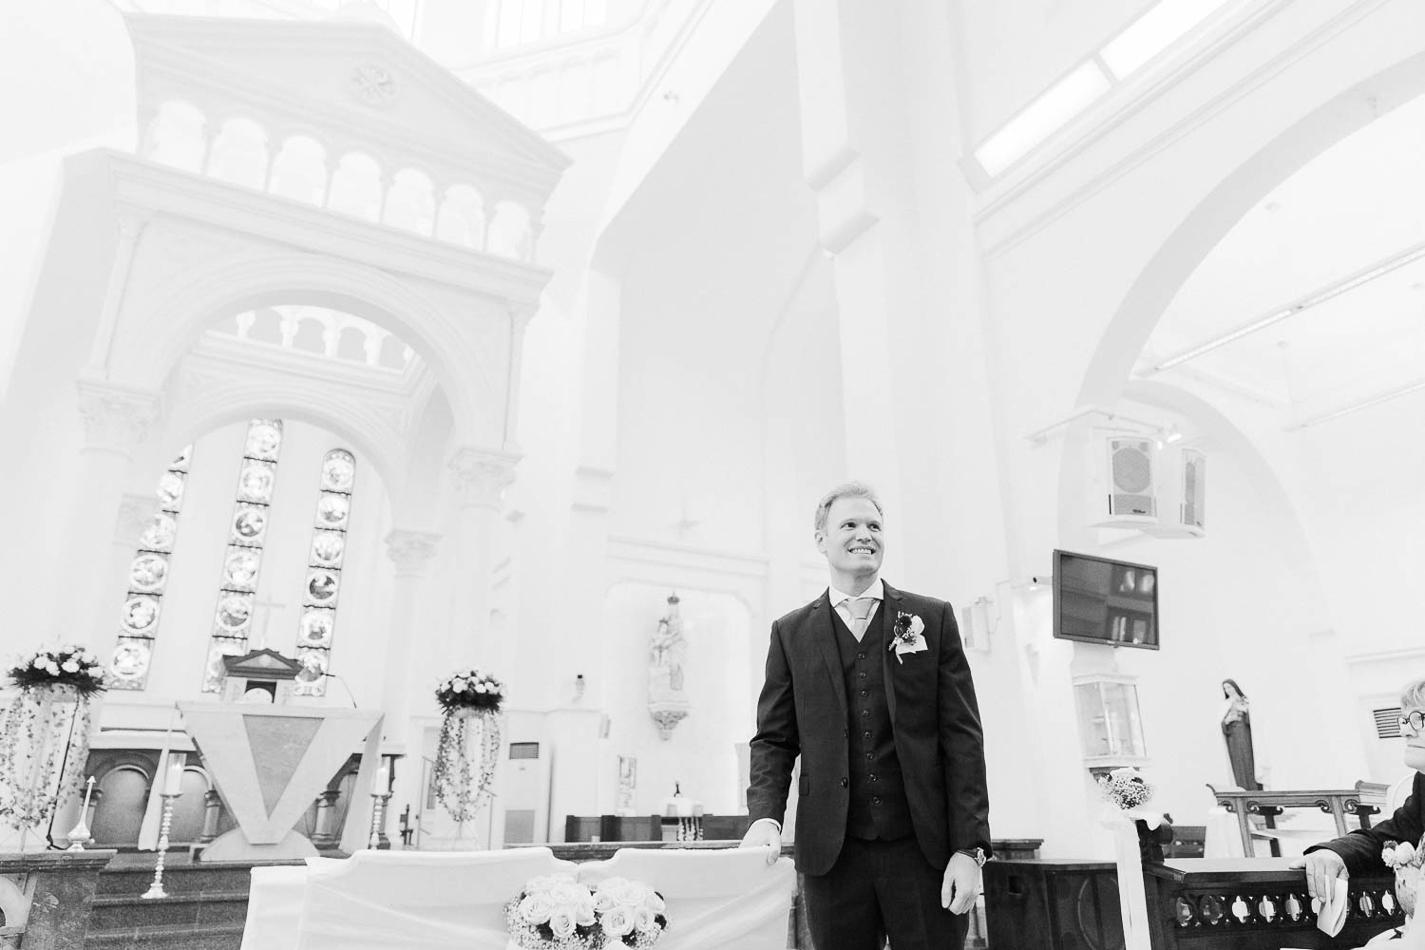 wedding-photographer-singapore-film-photographer-chen-sands-Anglea-wedding-CSPBLOG-7.jpg